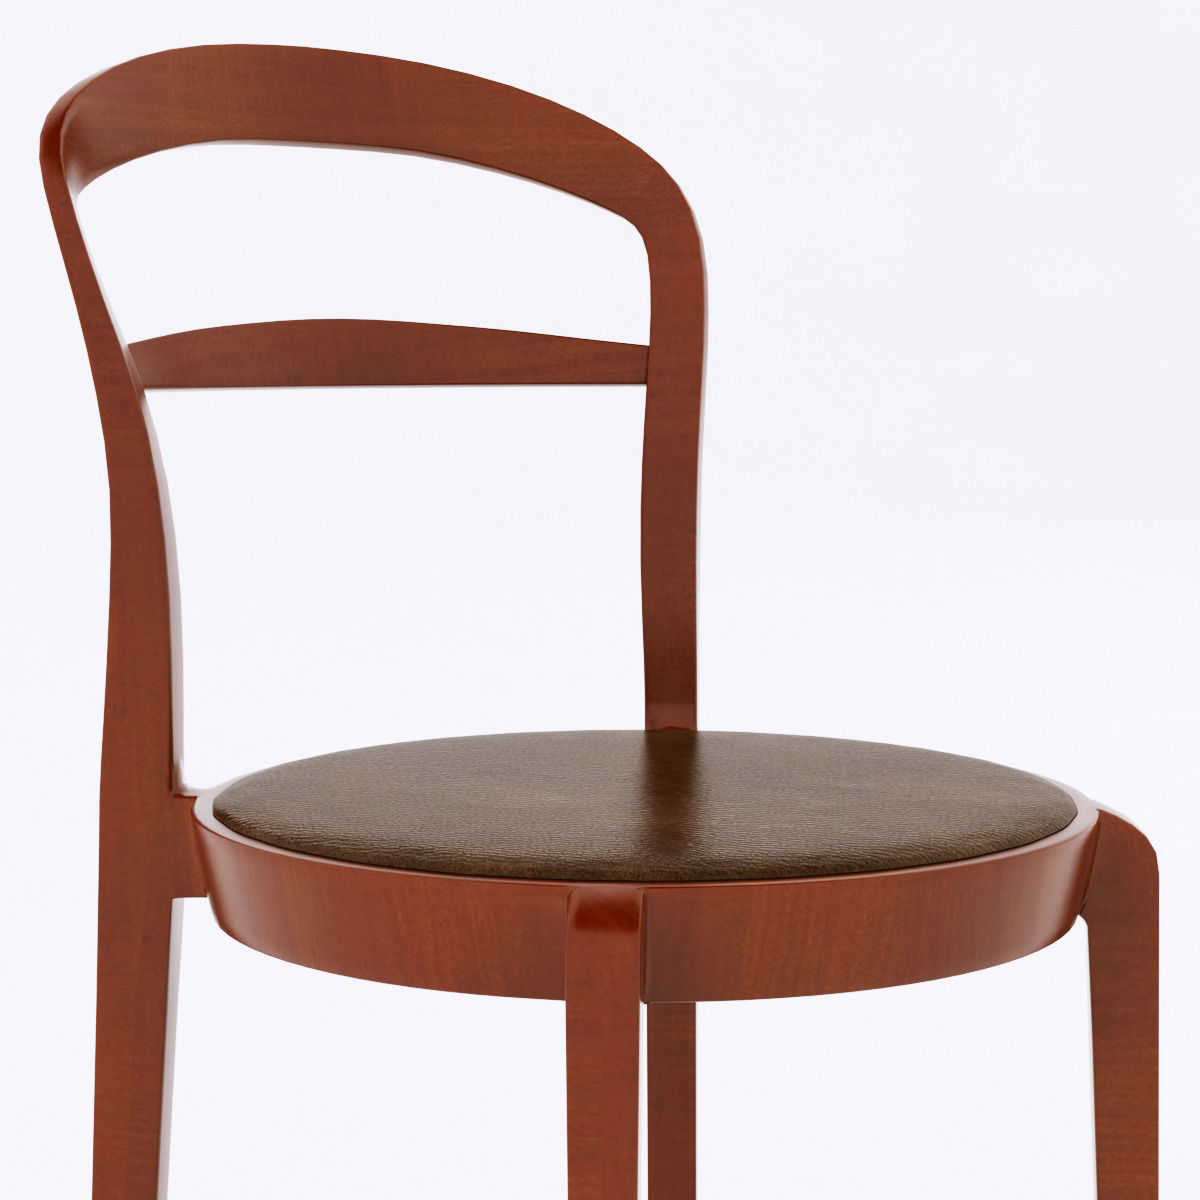 calligaris cloe chair 3d model max obj 3ds fbx. Black Bedroom Furniture Sets. Home Design Ideas